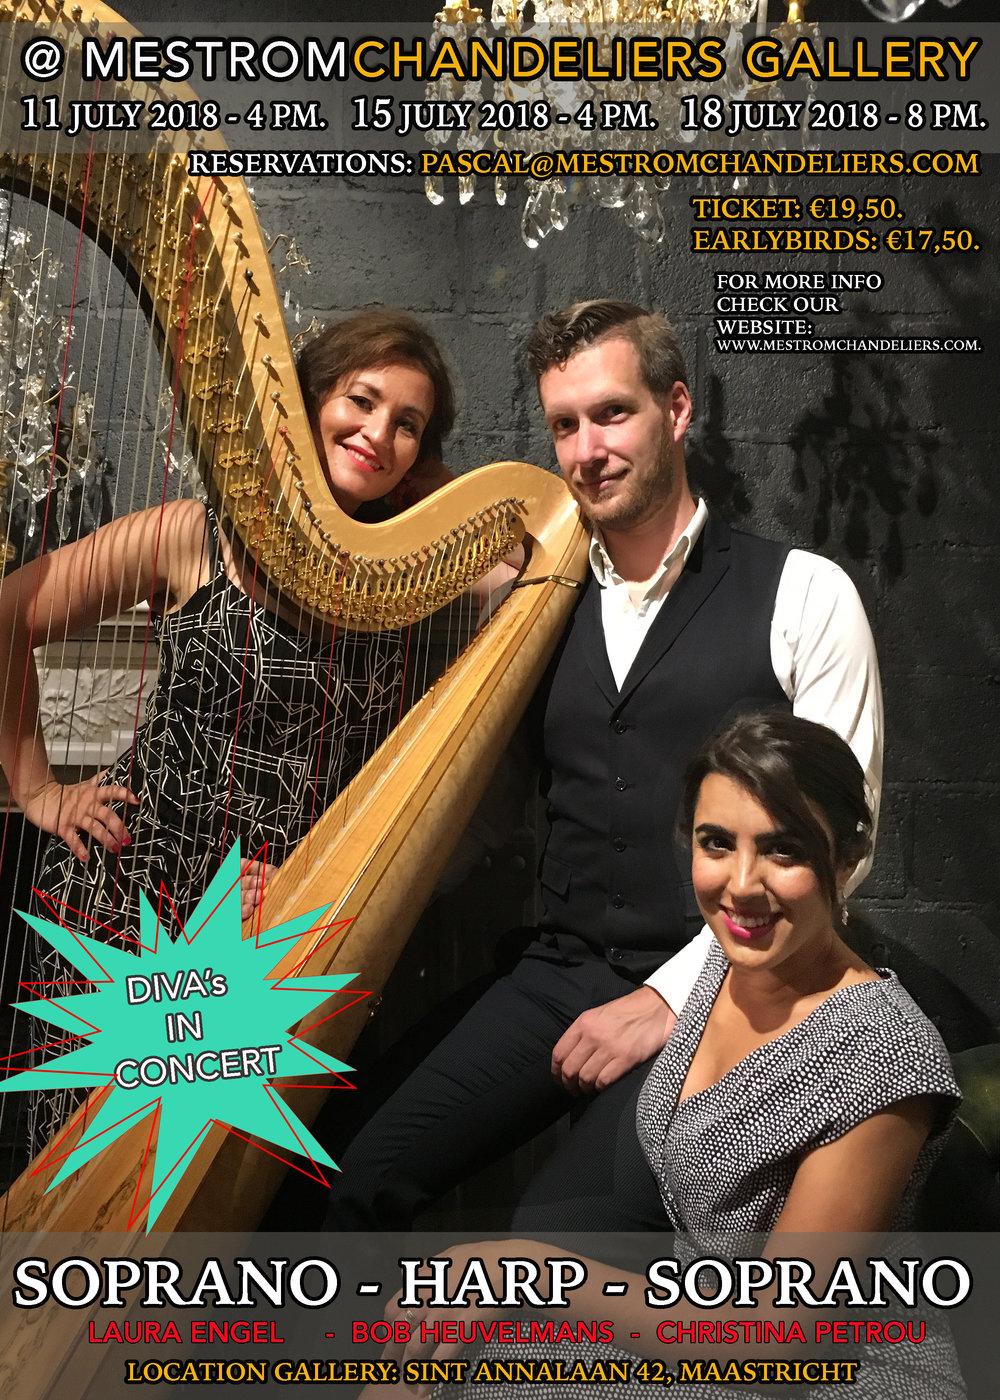 Diva's in Concert - 2 sopranos and a harp...quite a unique combination.